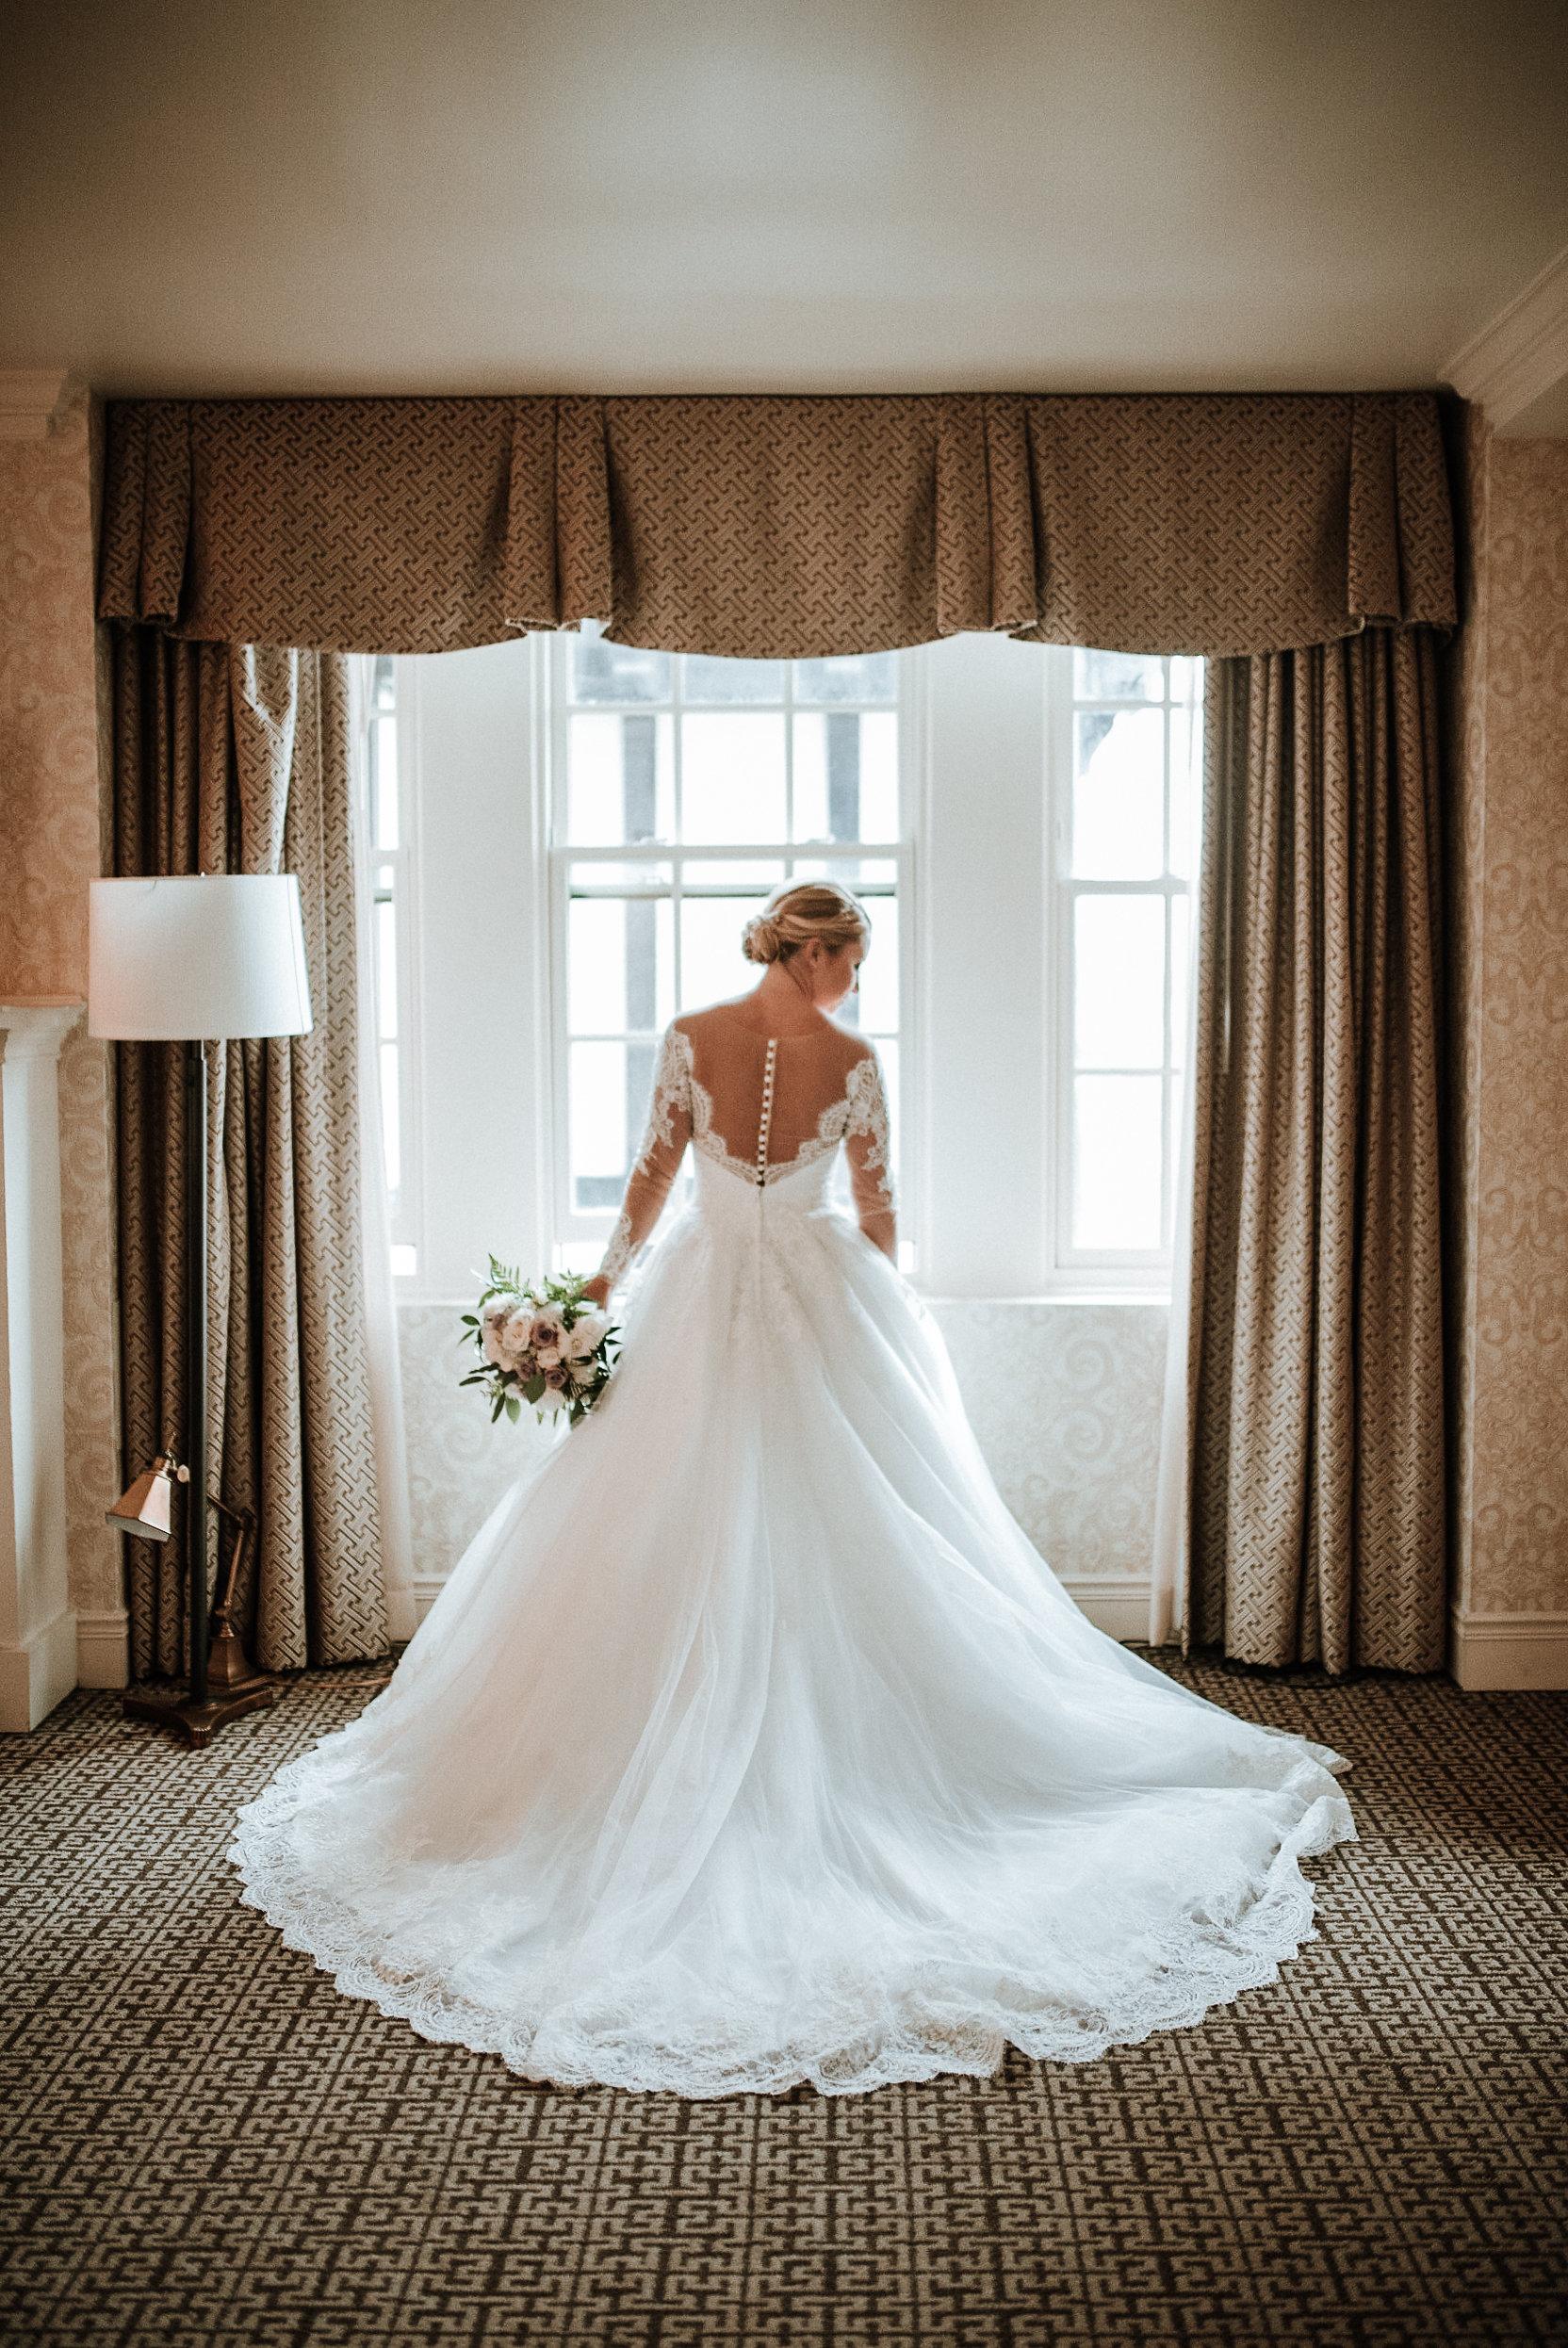 Bride standing in front of windows